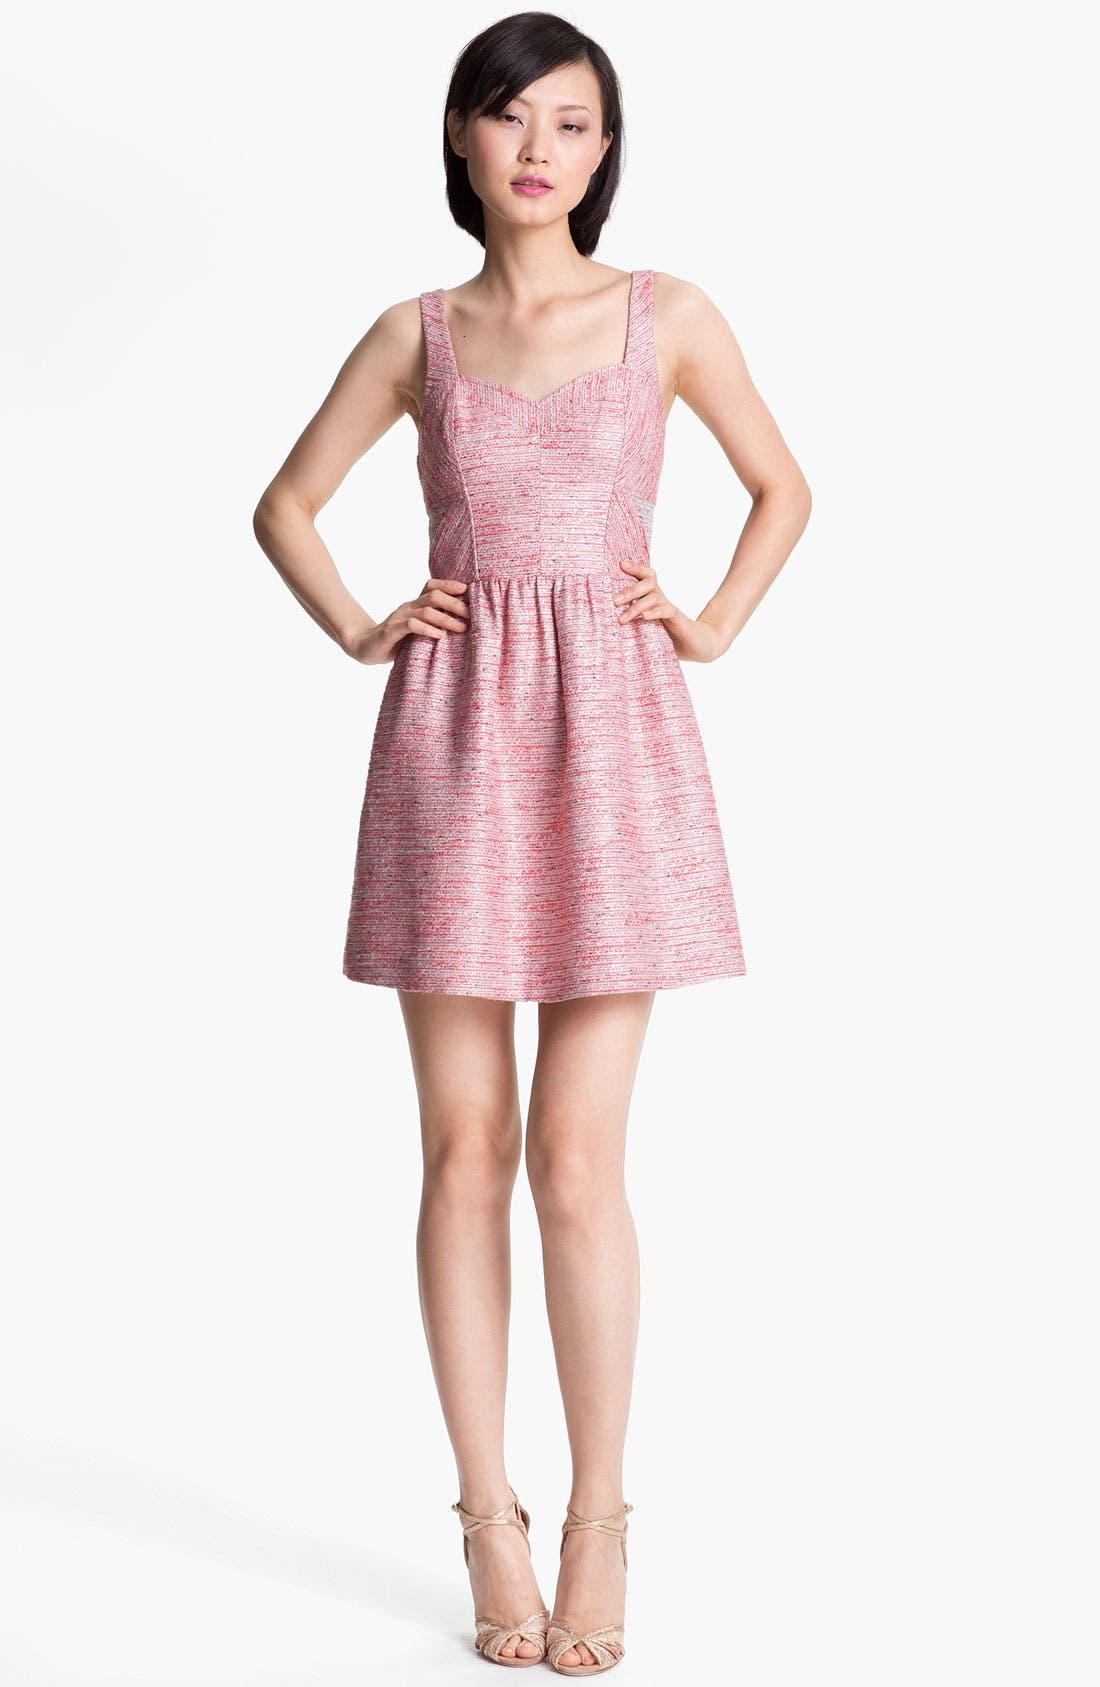 Alternate Image 1 Selected - Mcginn Dress & Accessories